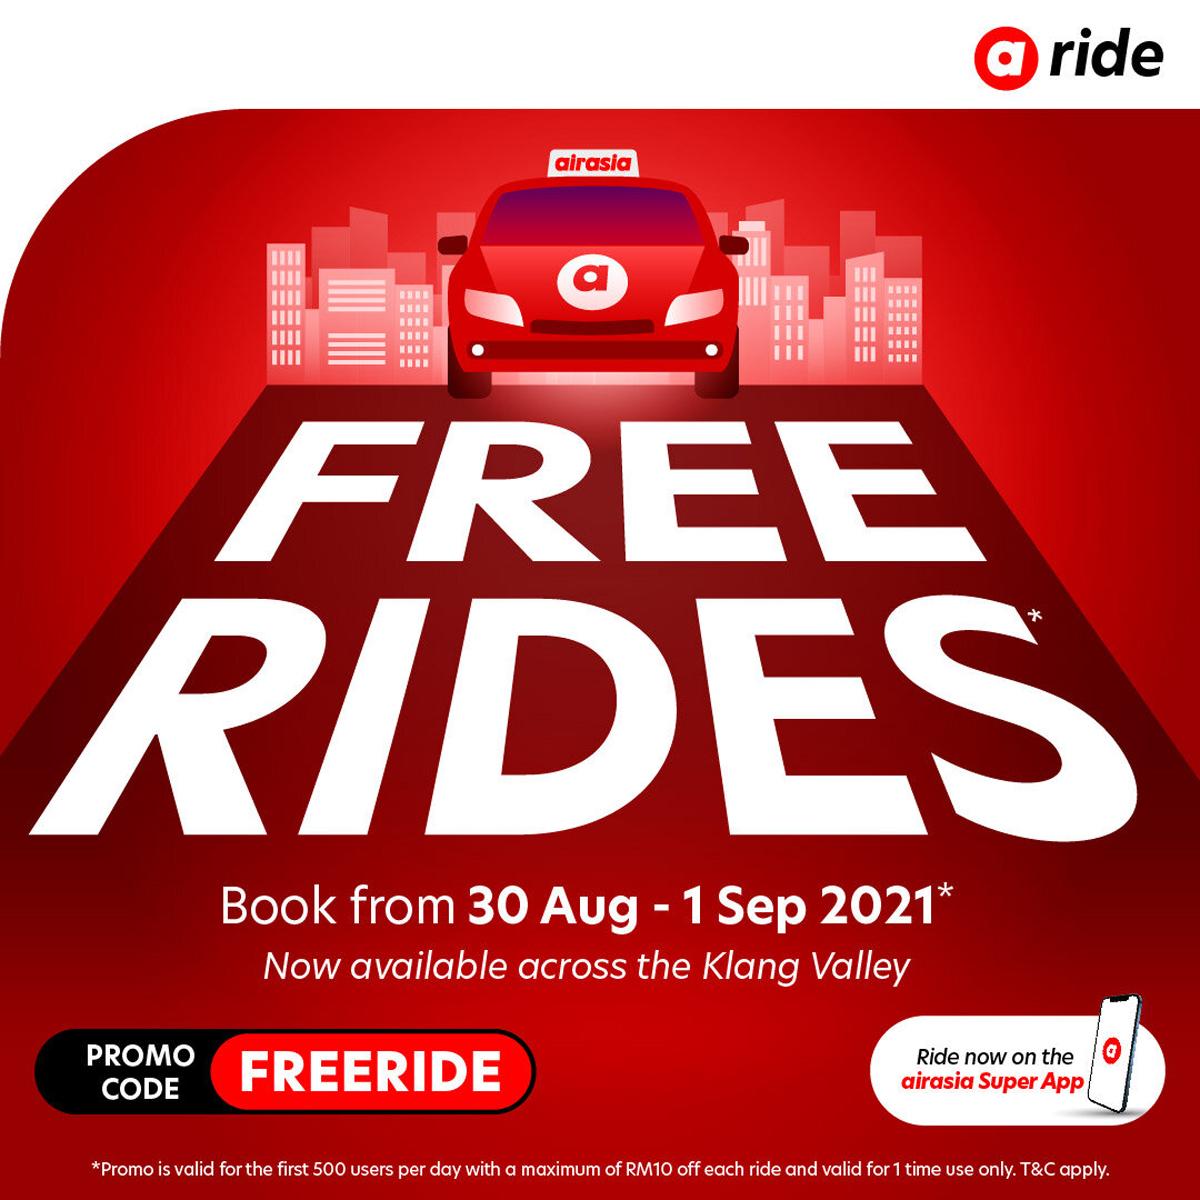 AirAsia Ride Discount Promotion